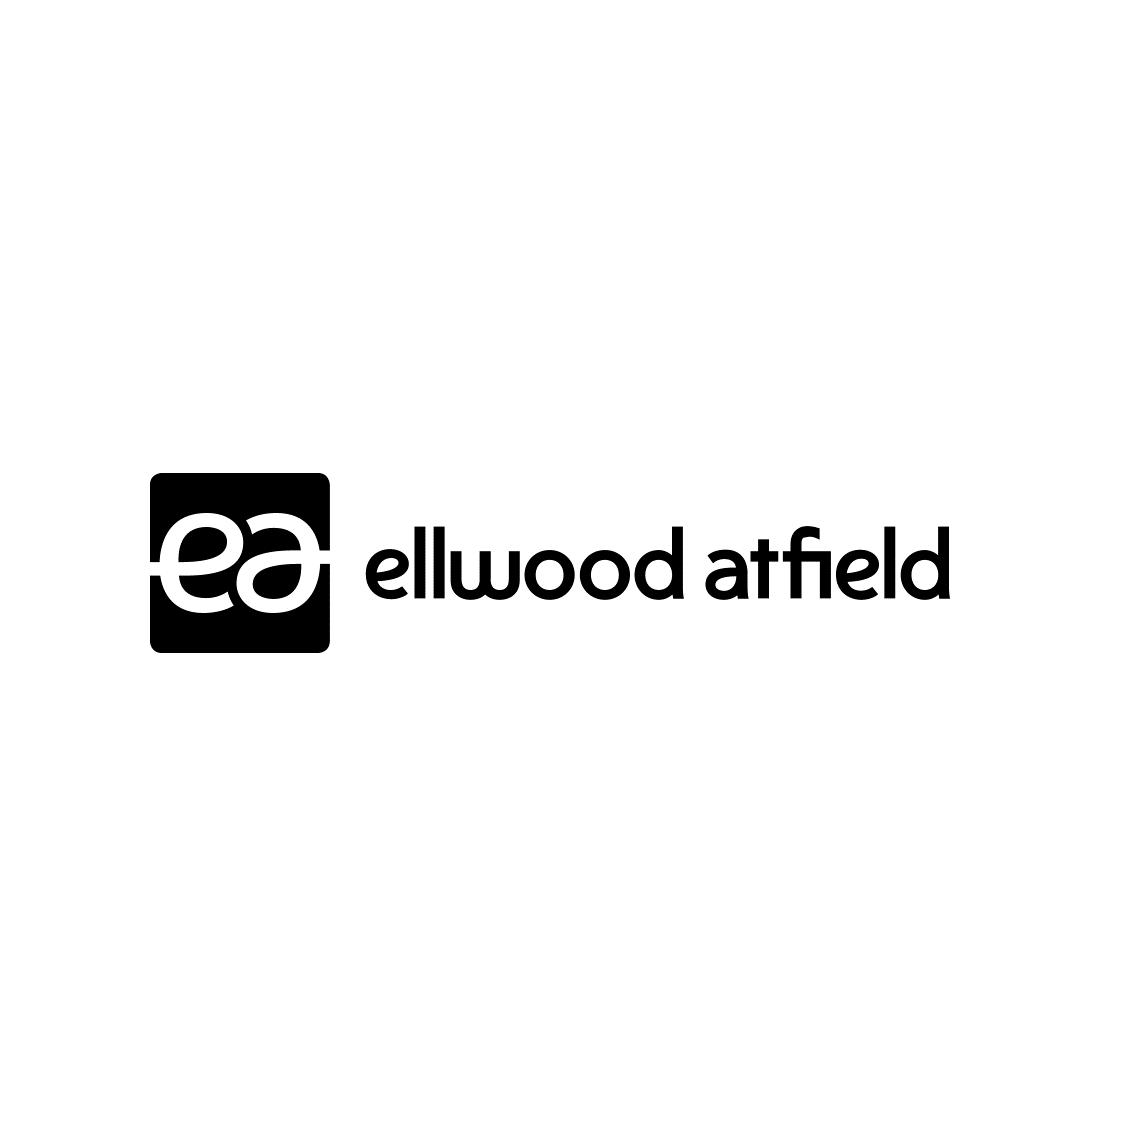 Ellwood.png